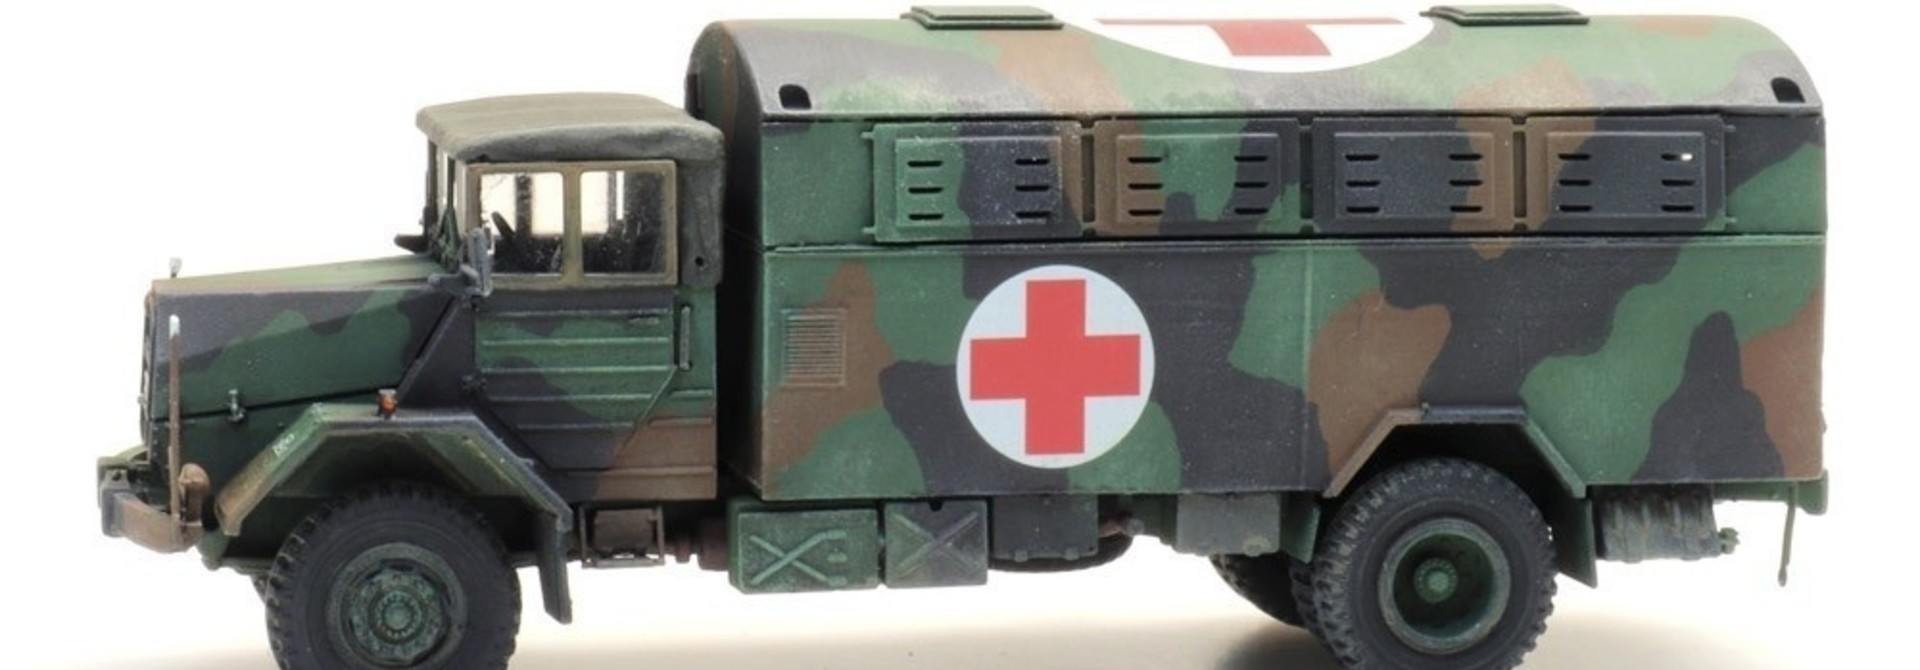 6870419 BRD MAN 630 L2 A Großraum-Krankenkraftwagen (KrKw GR)